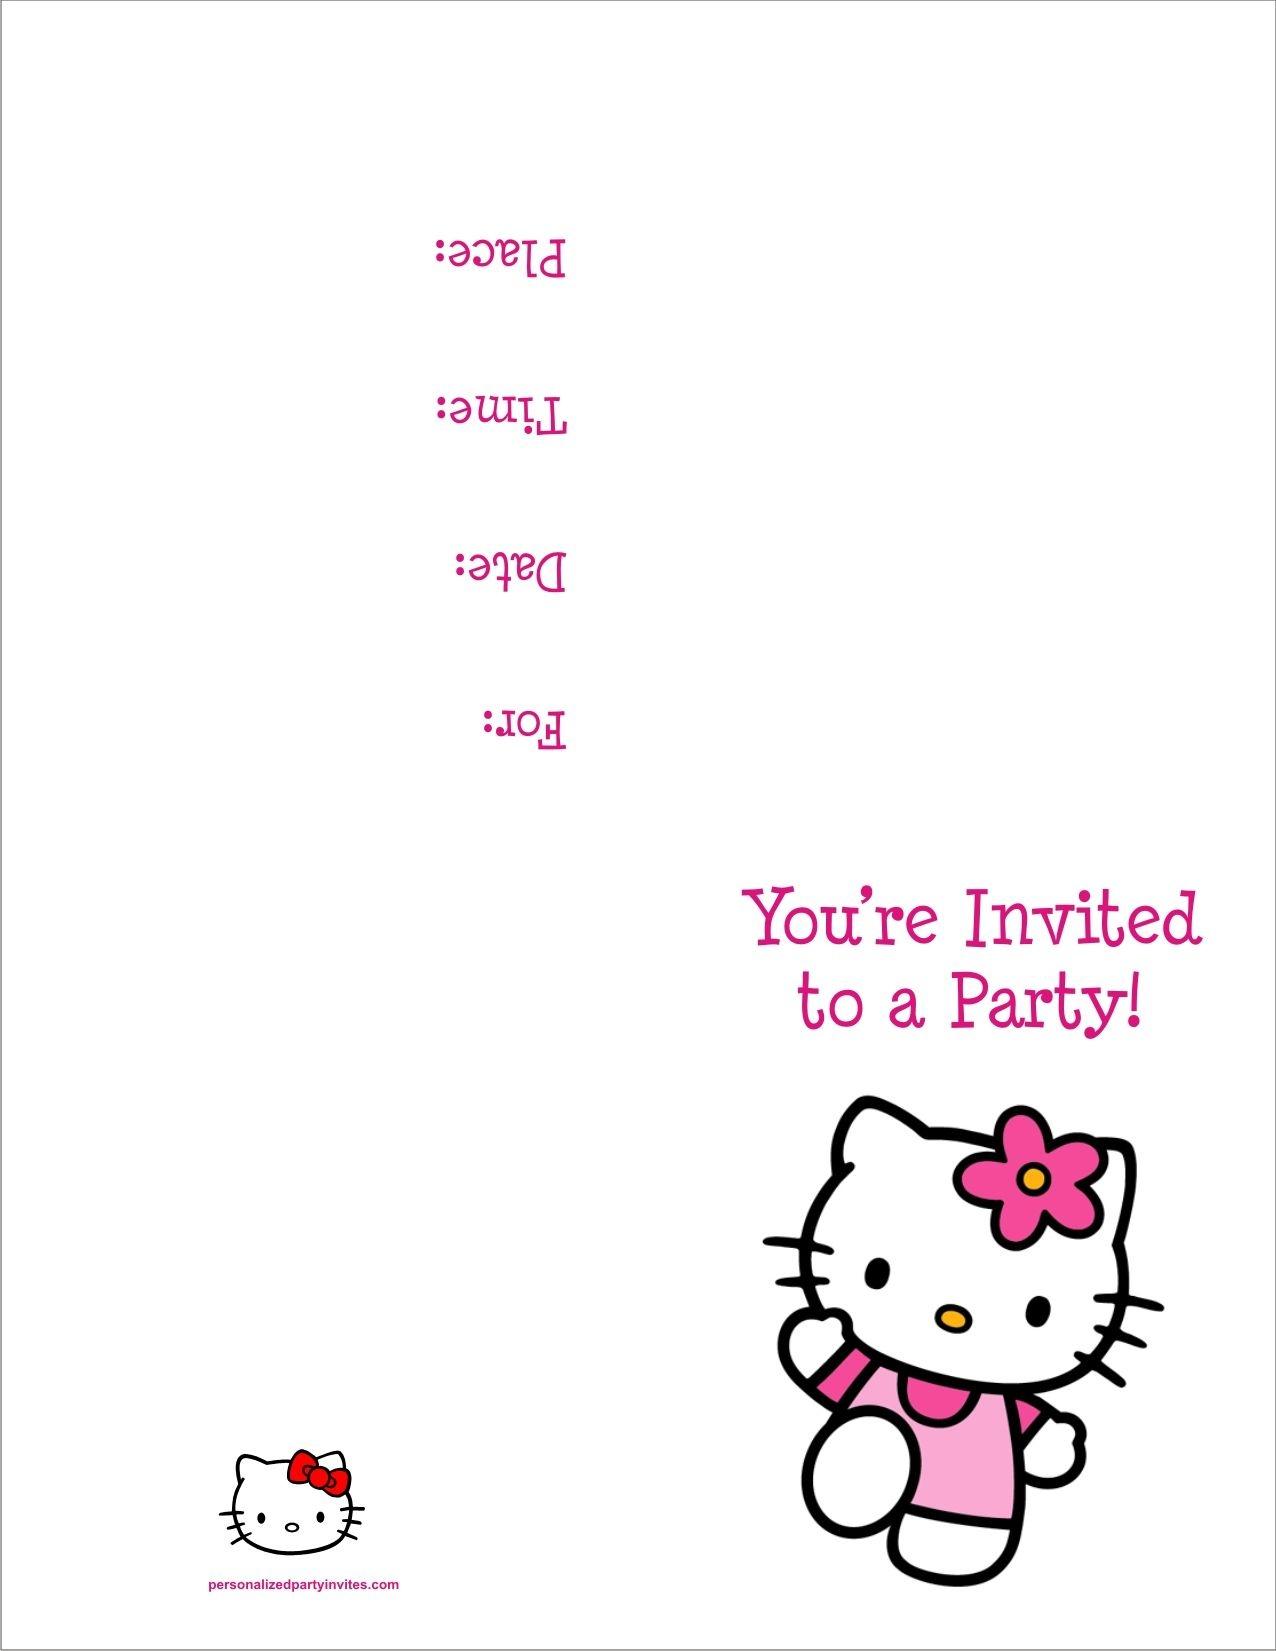 Pinrachel Benson On Hello Kitty Bday | Hello Kitty Birthday - Free Printable Hello Kitty Baby Shower Invitations